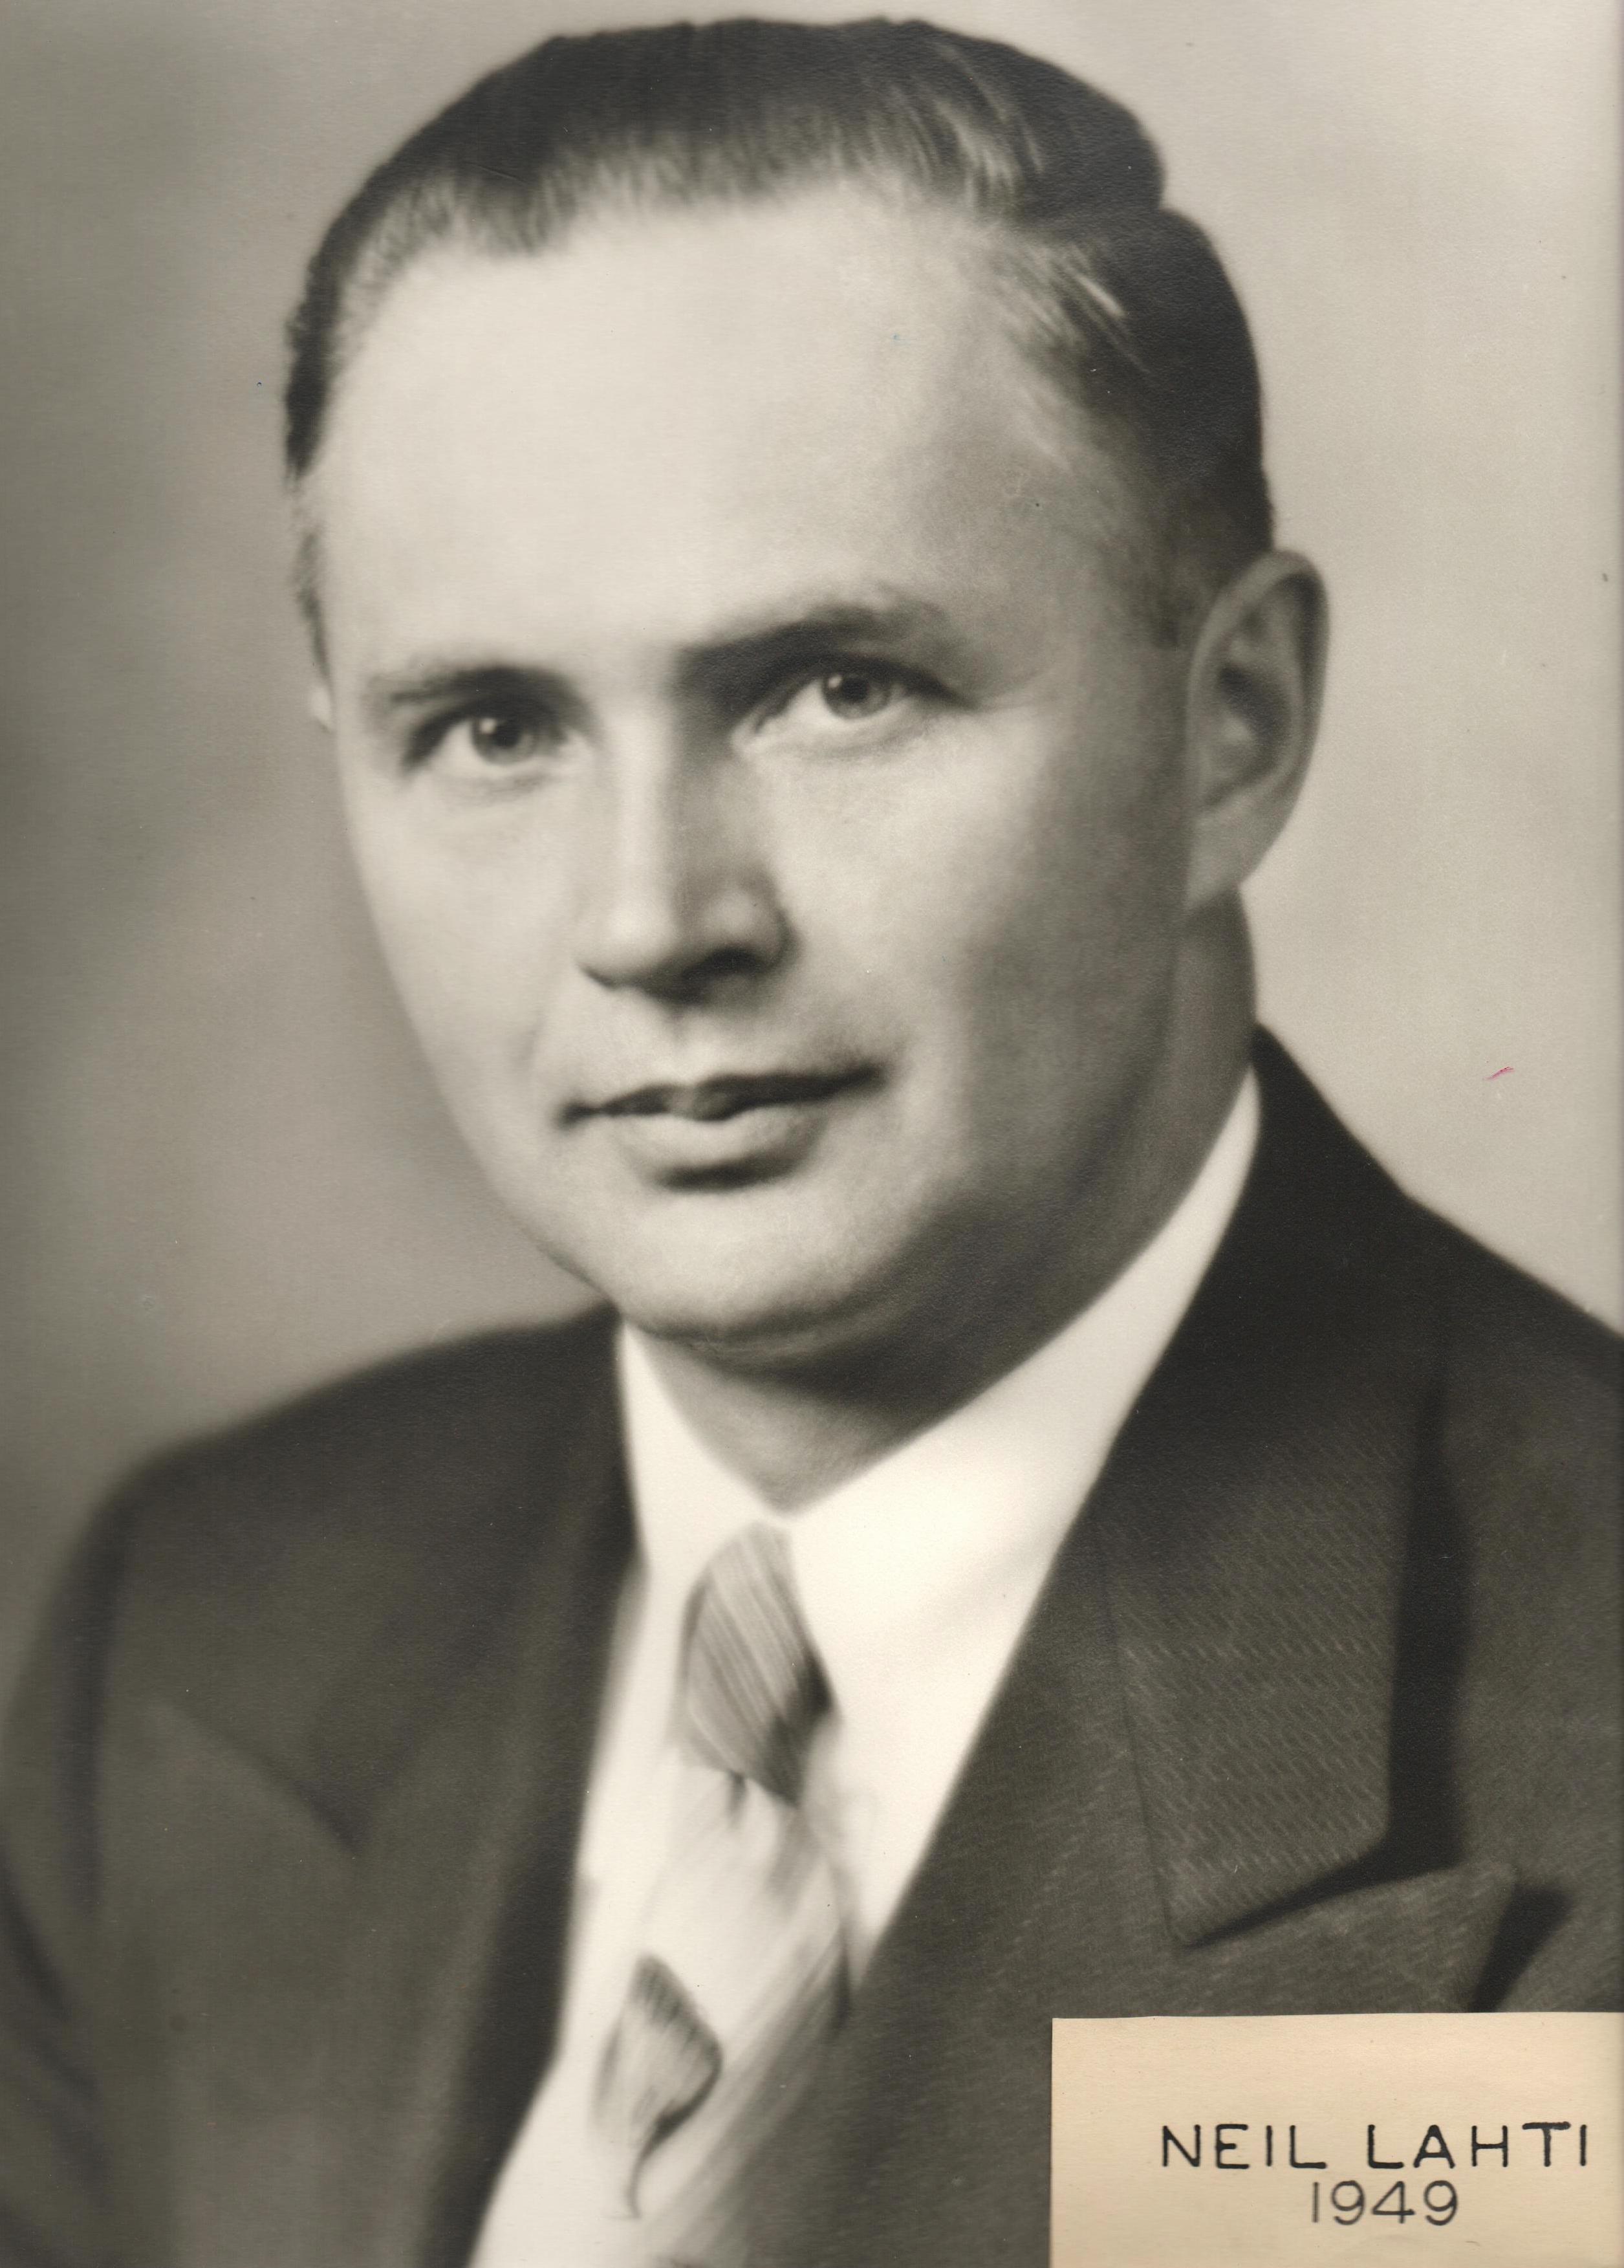 1949 Neil Lahti